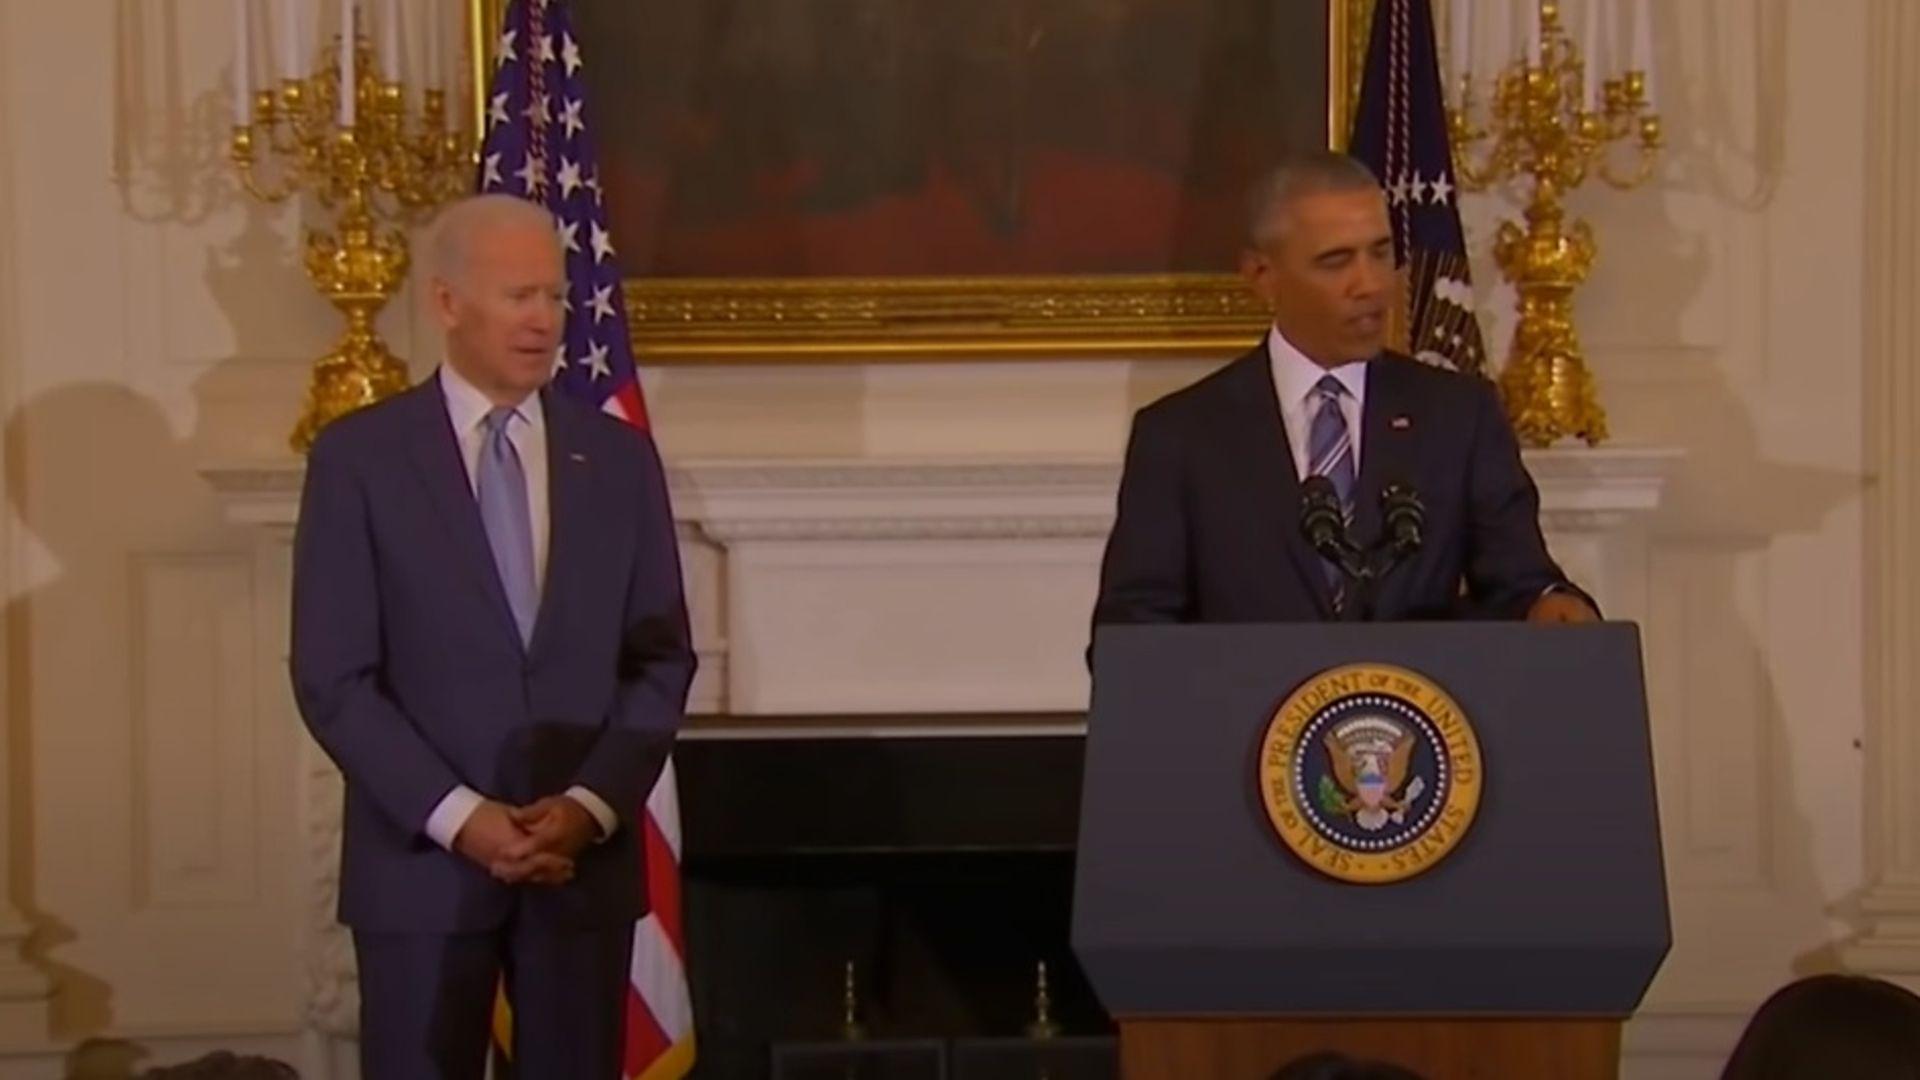 Joe Biden with Barack Obama back in 2016 - Credit: YouTube